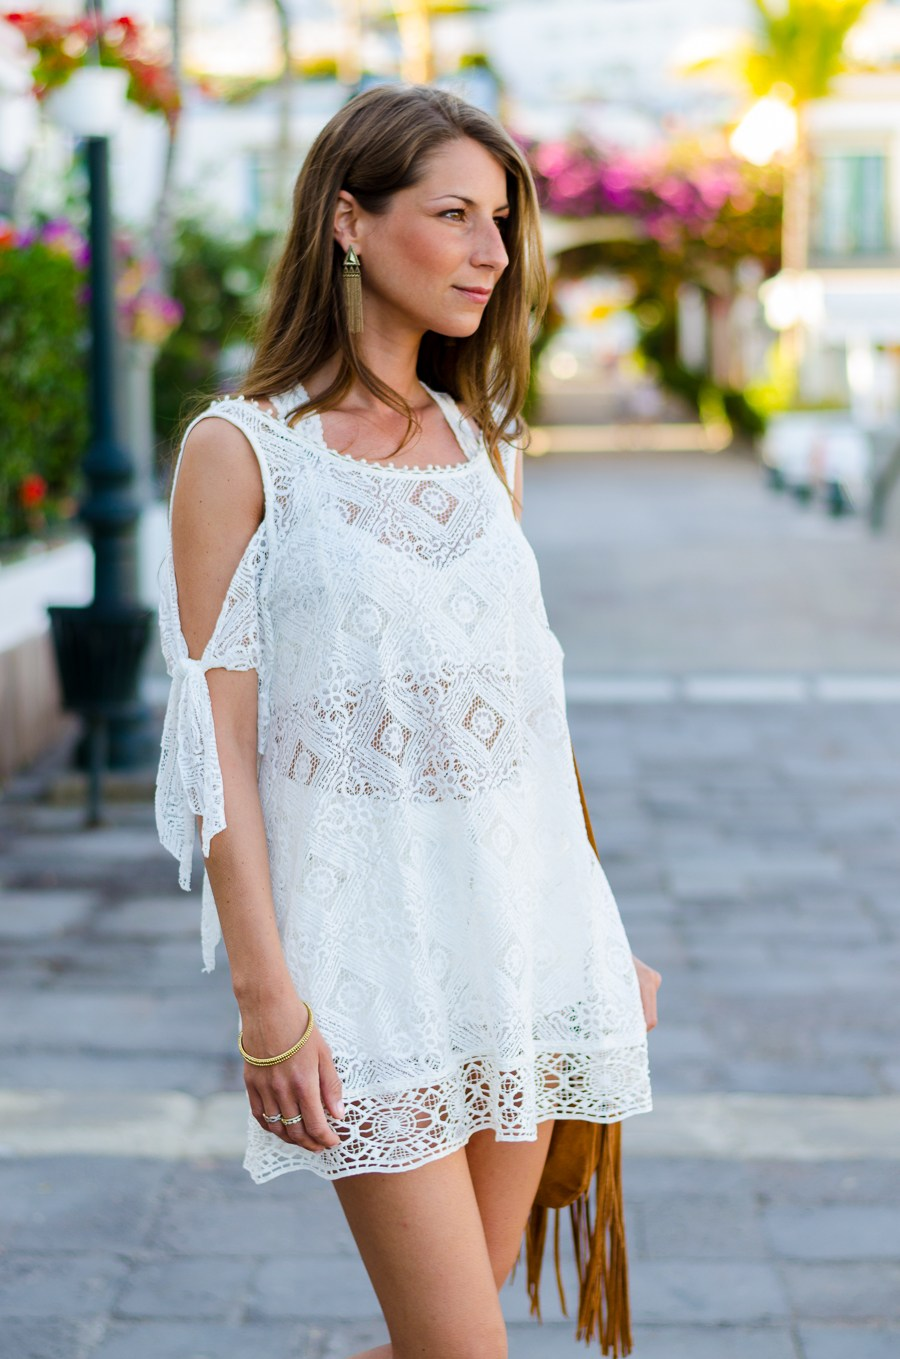 white lace dress free people isabel marant gladiator sandals fashion blogger summer vacation style